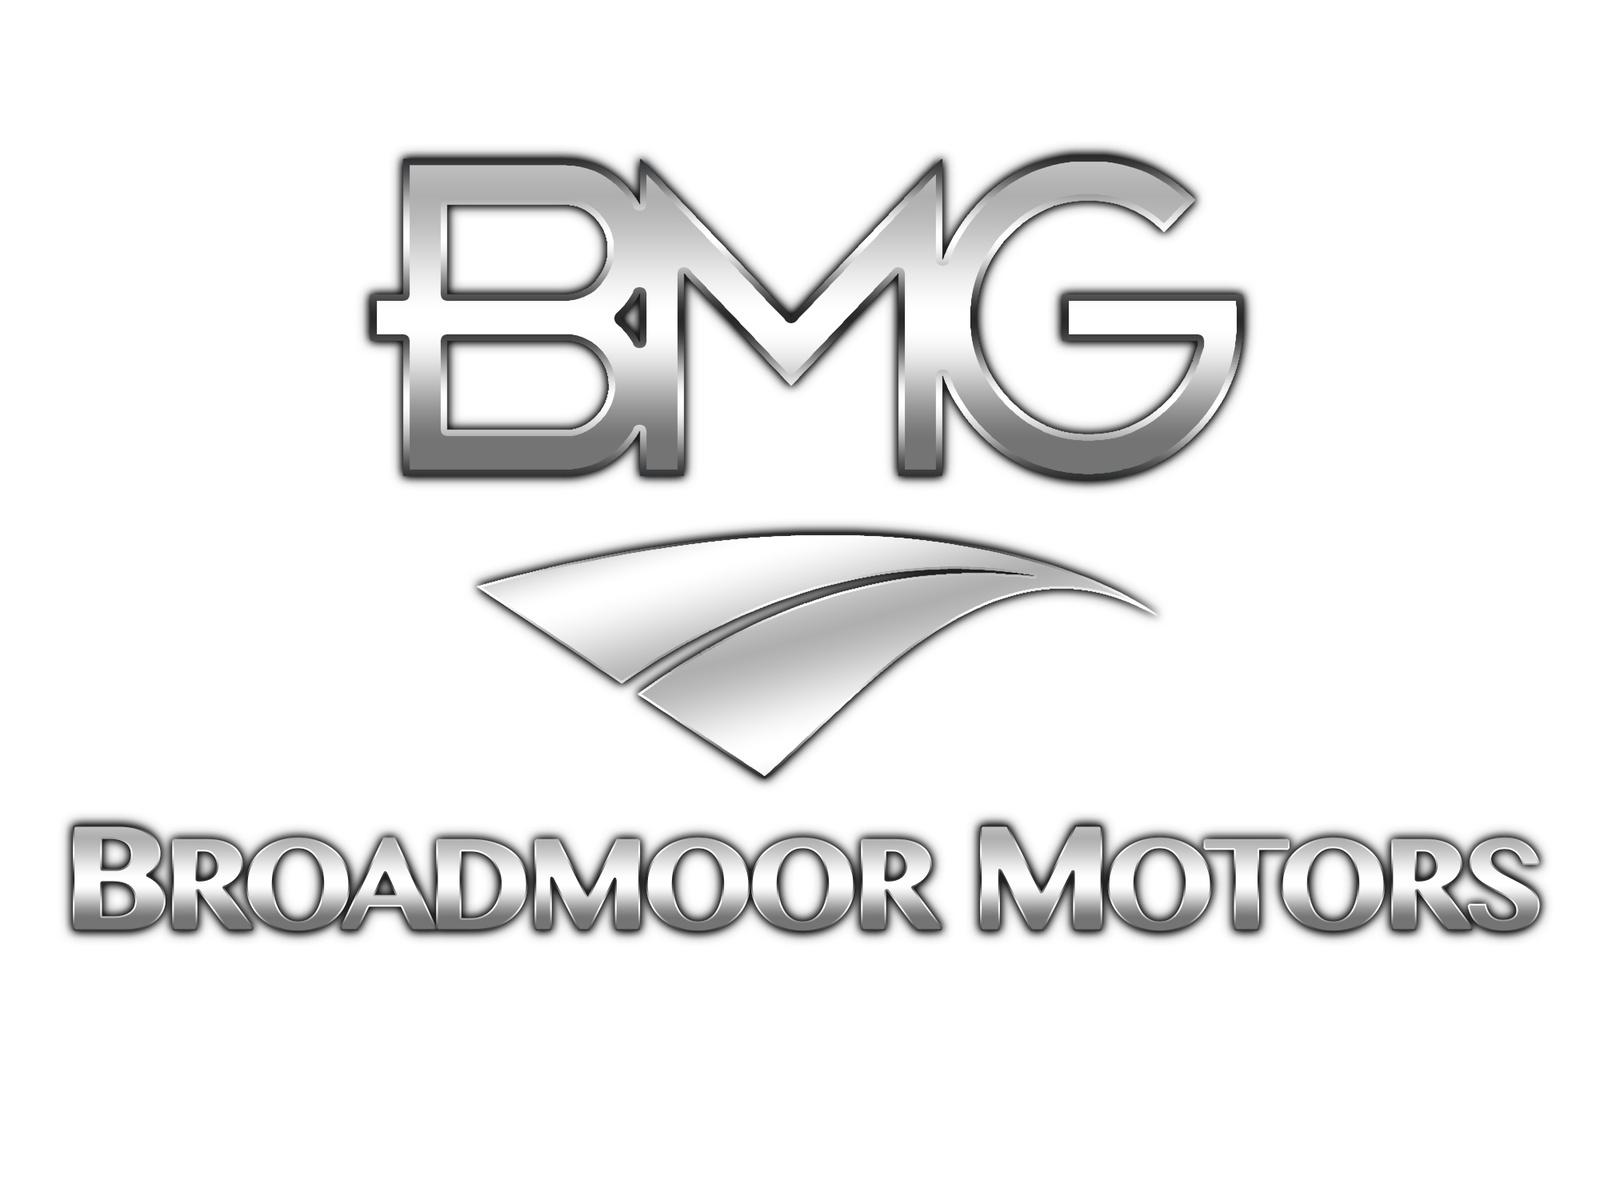 broadmoor motors hastings hastings mi read consumer reviews rh cargurus com